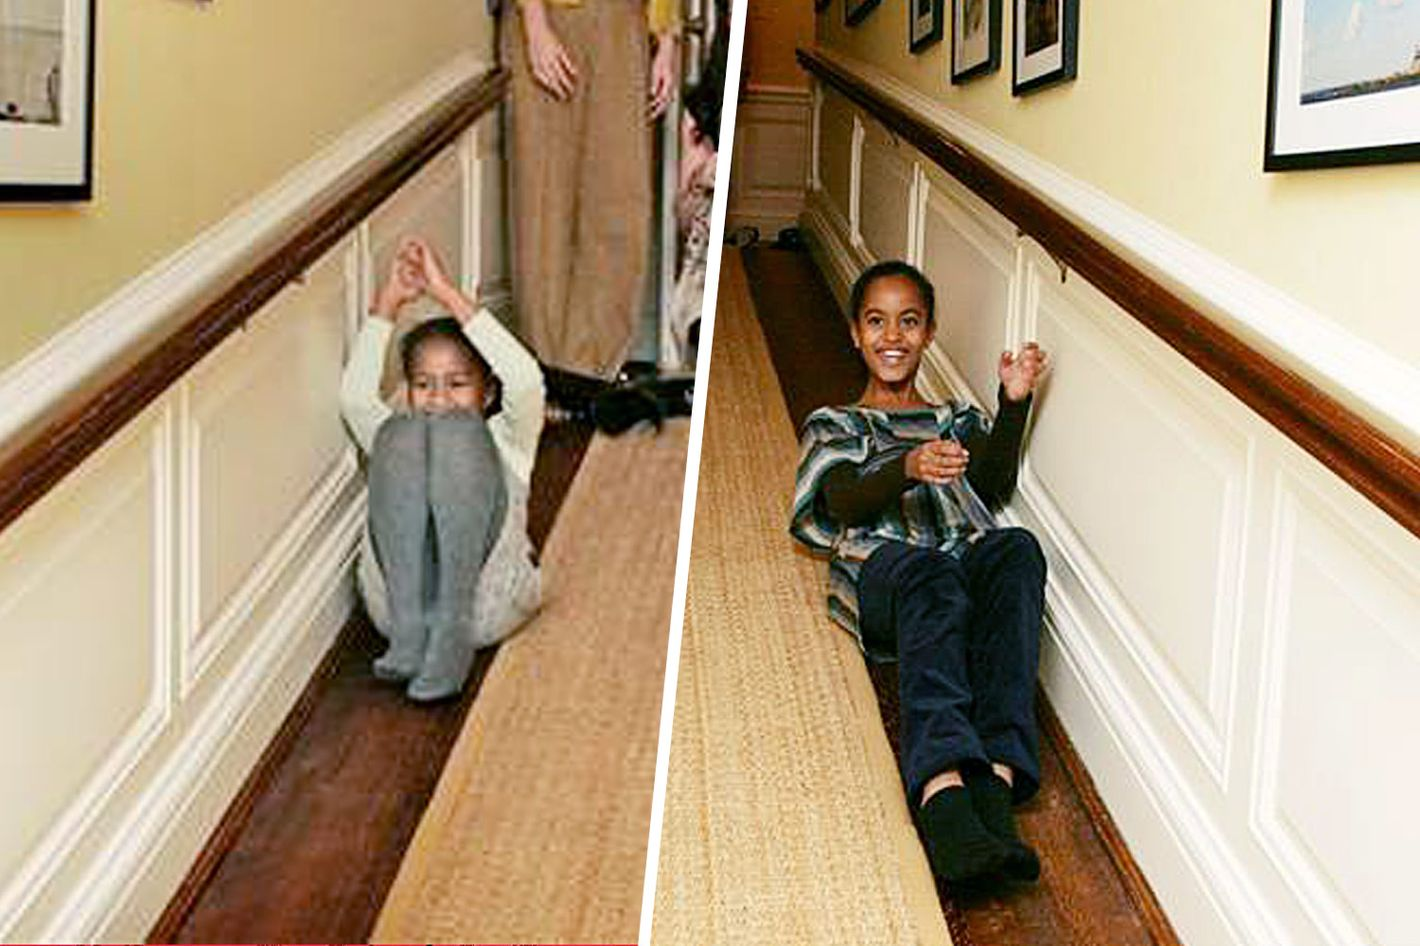 Adorable Photos Of Malia And Sashas First White House Visit. Malia And Sasha Obama Bedrooms   cryp us